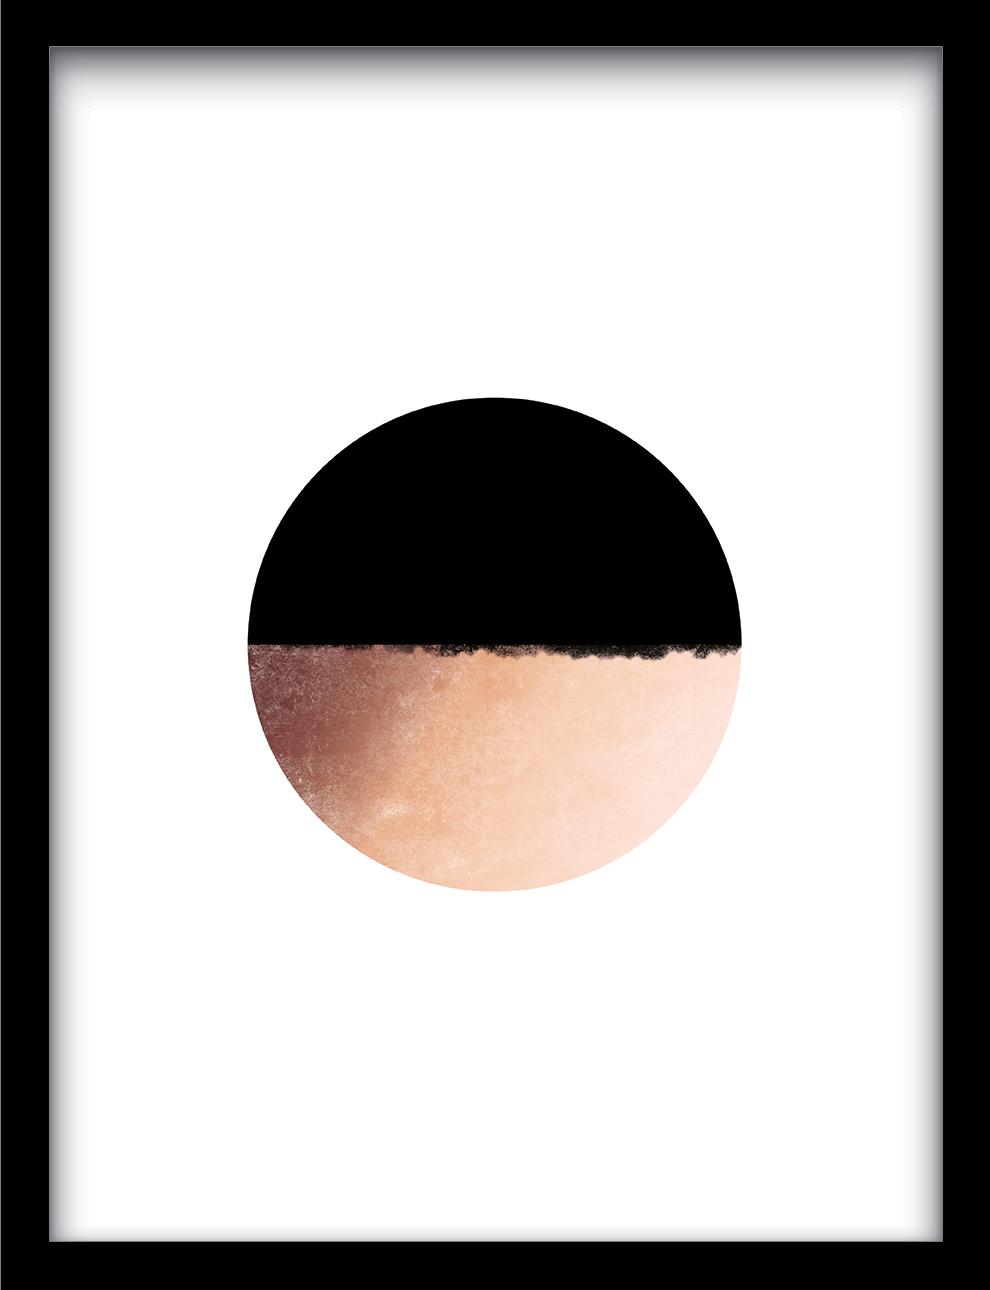 Circle collision